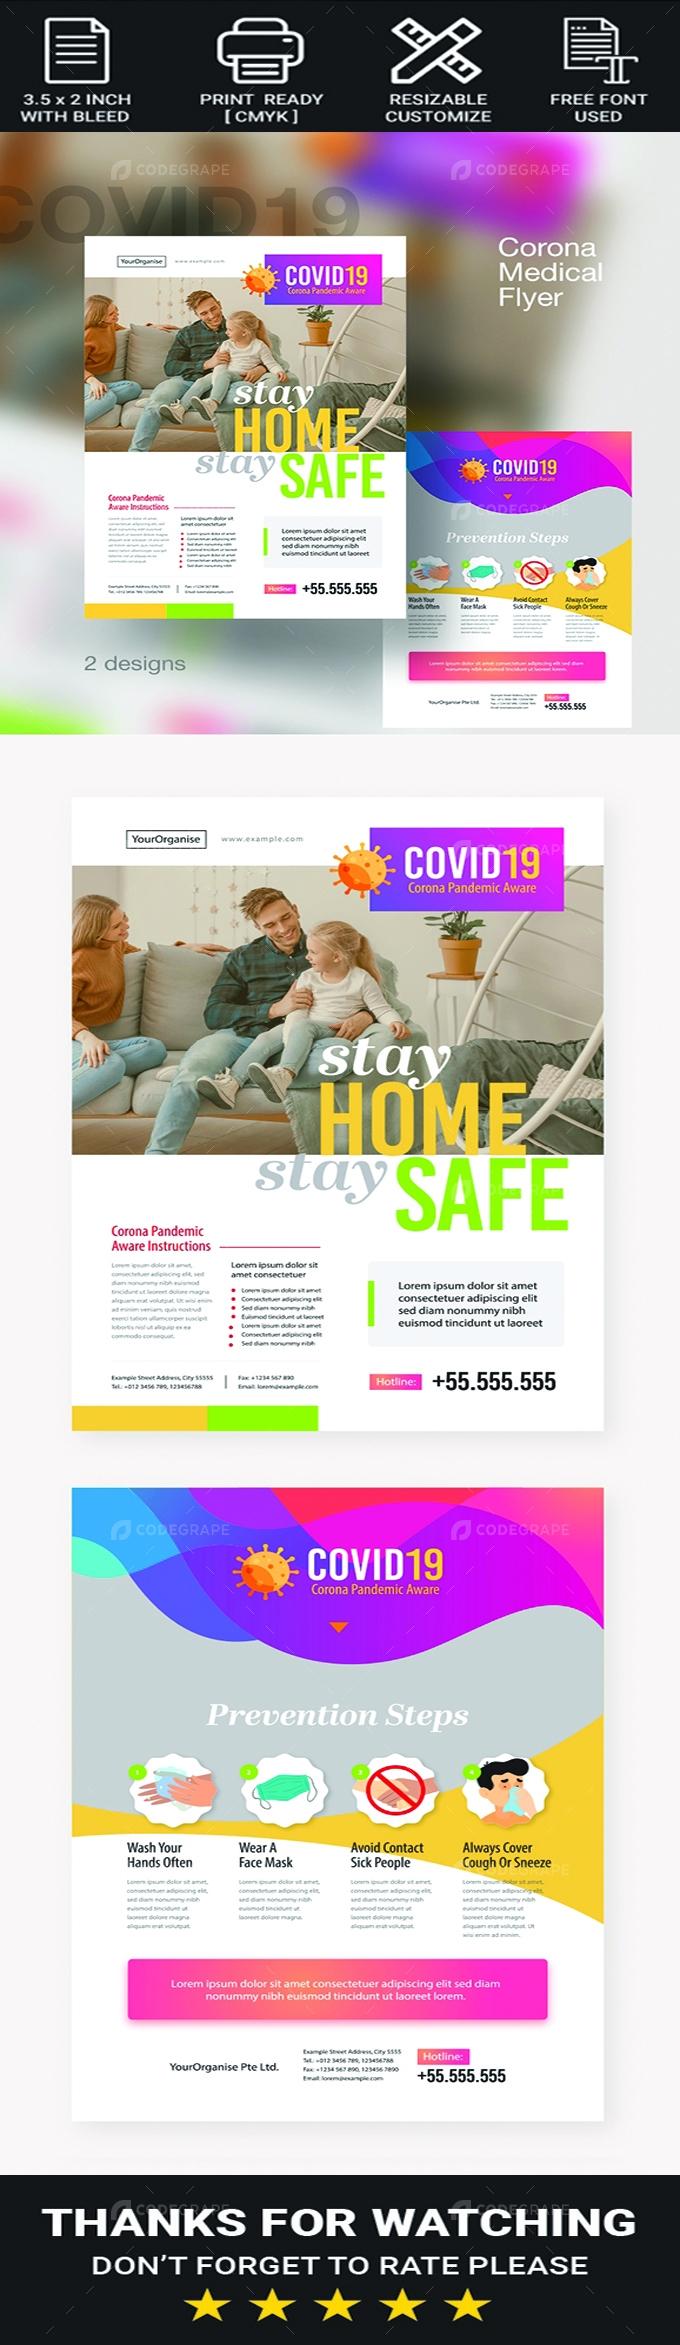 Covid19 Treatment Medical Flyer